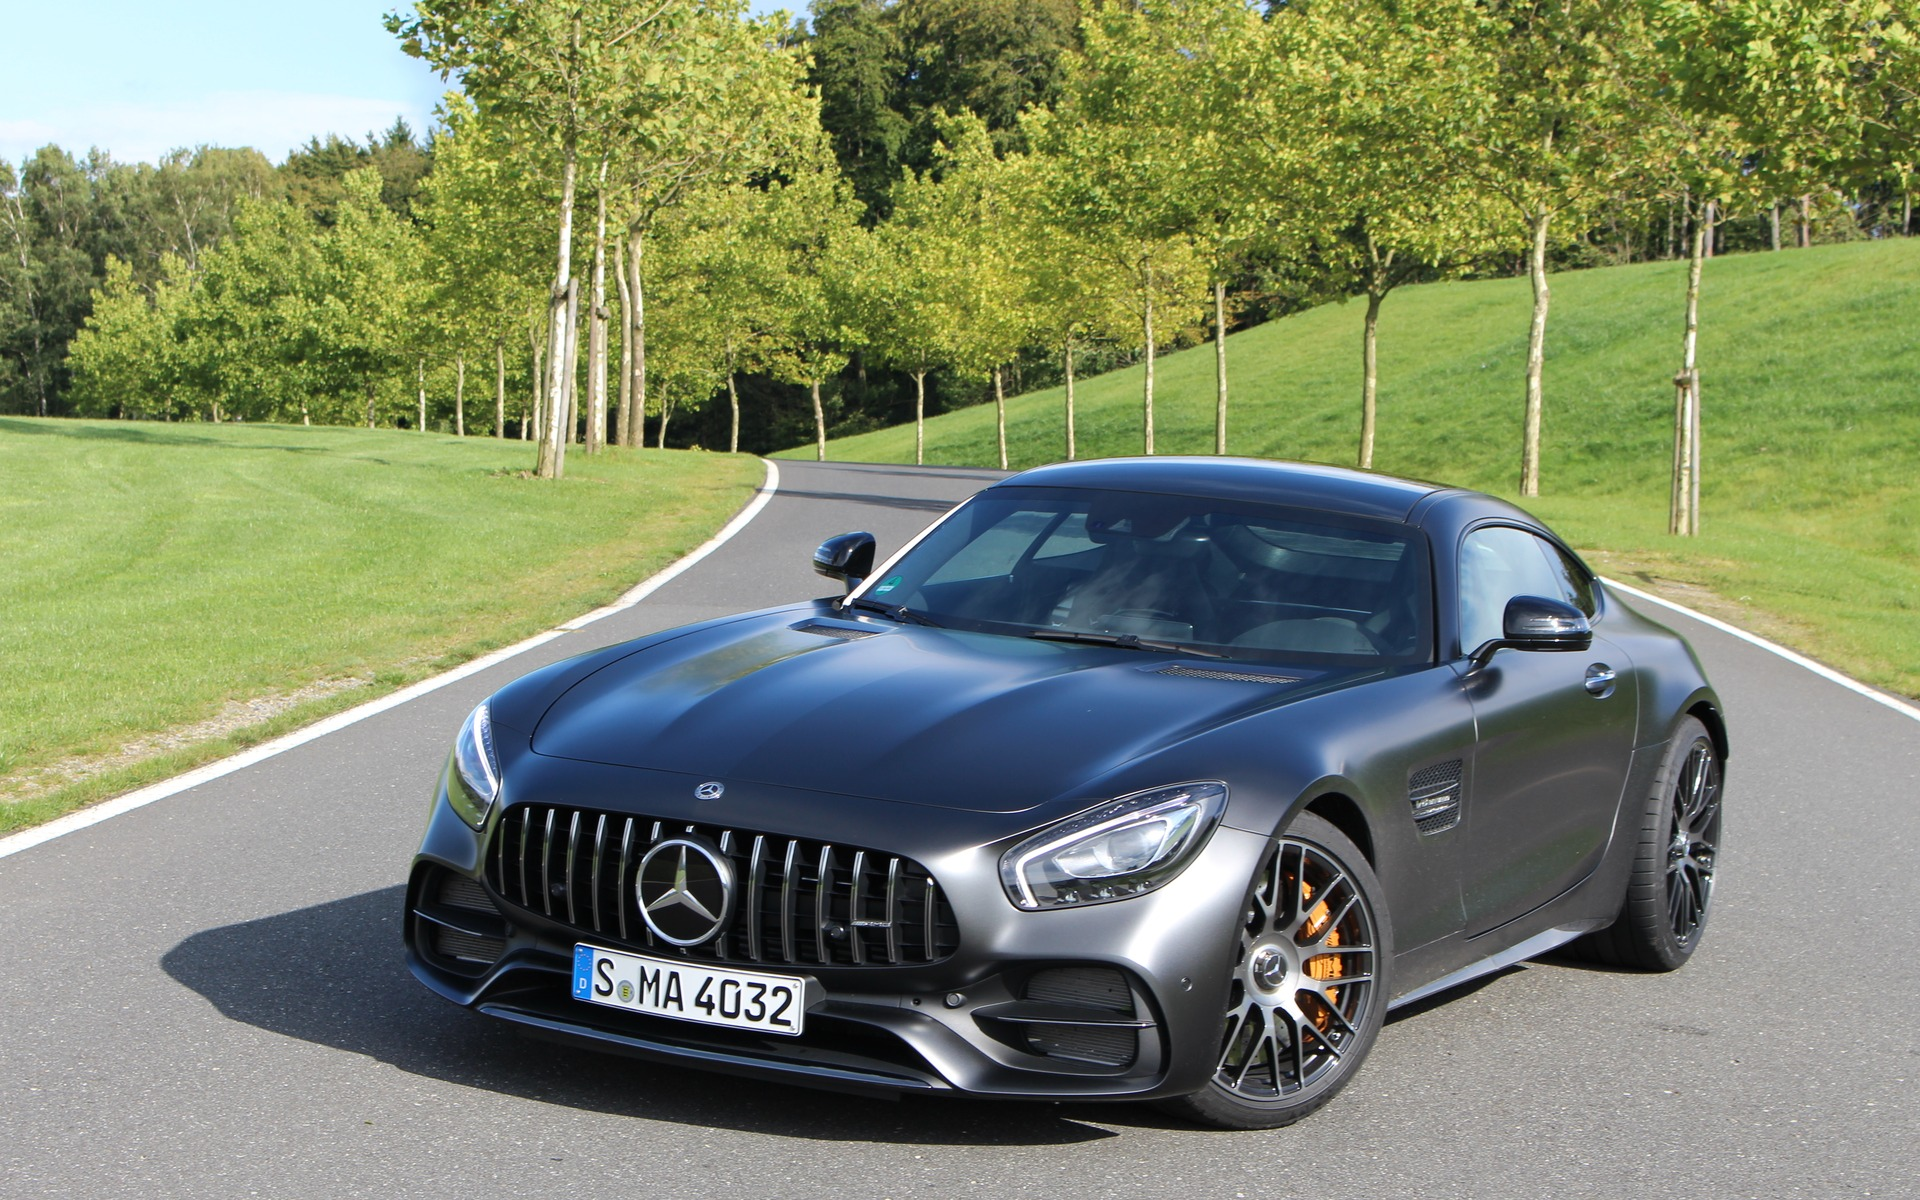 <p>Mercedes-AMG GT C Edition 502018</p>